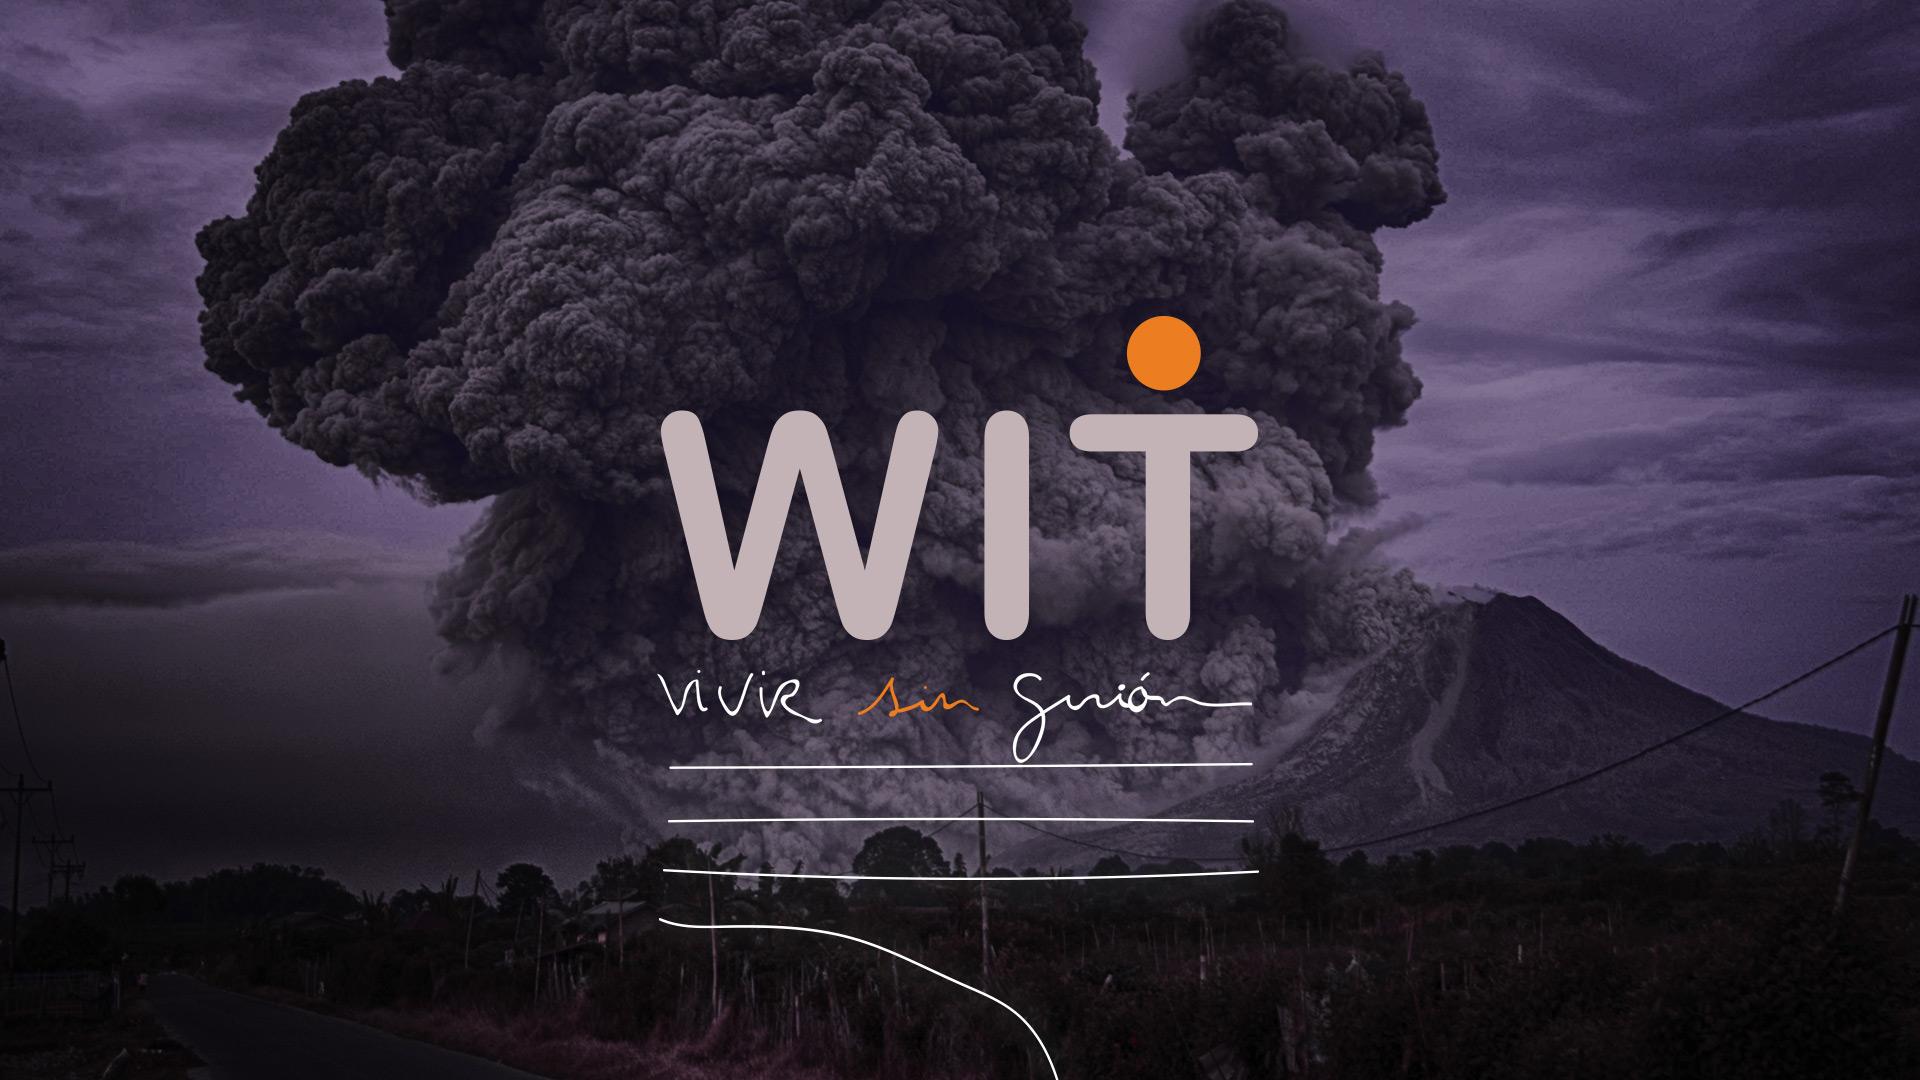 WIT_h2.jpg